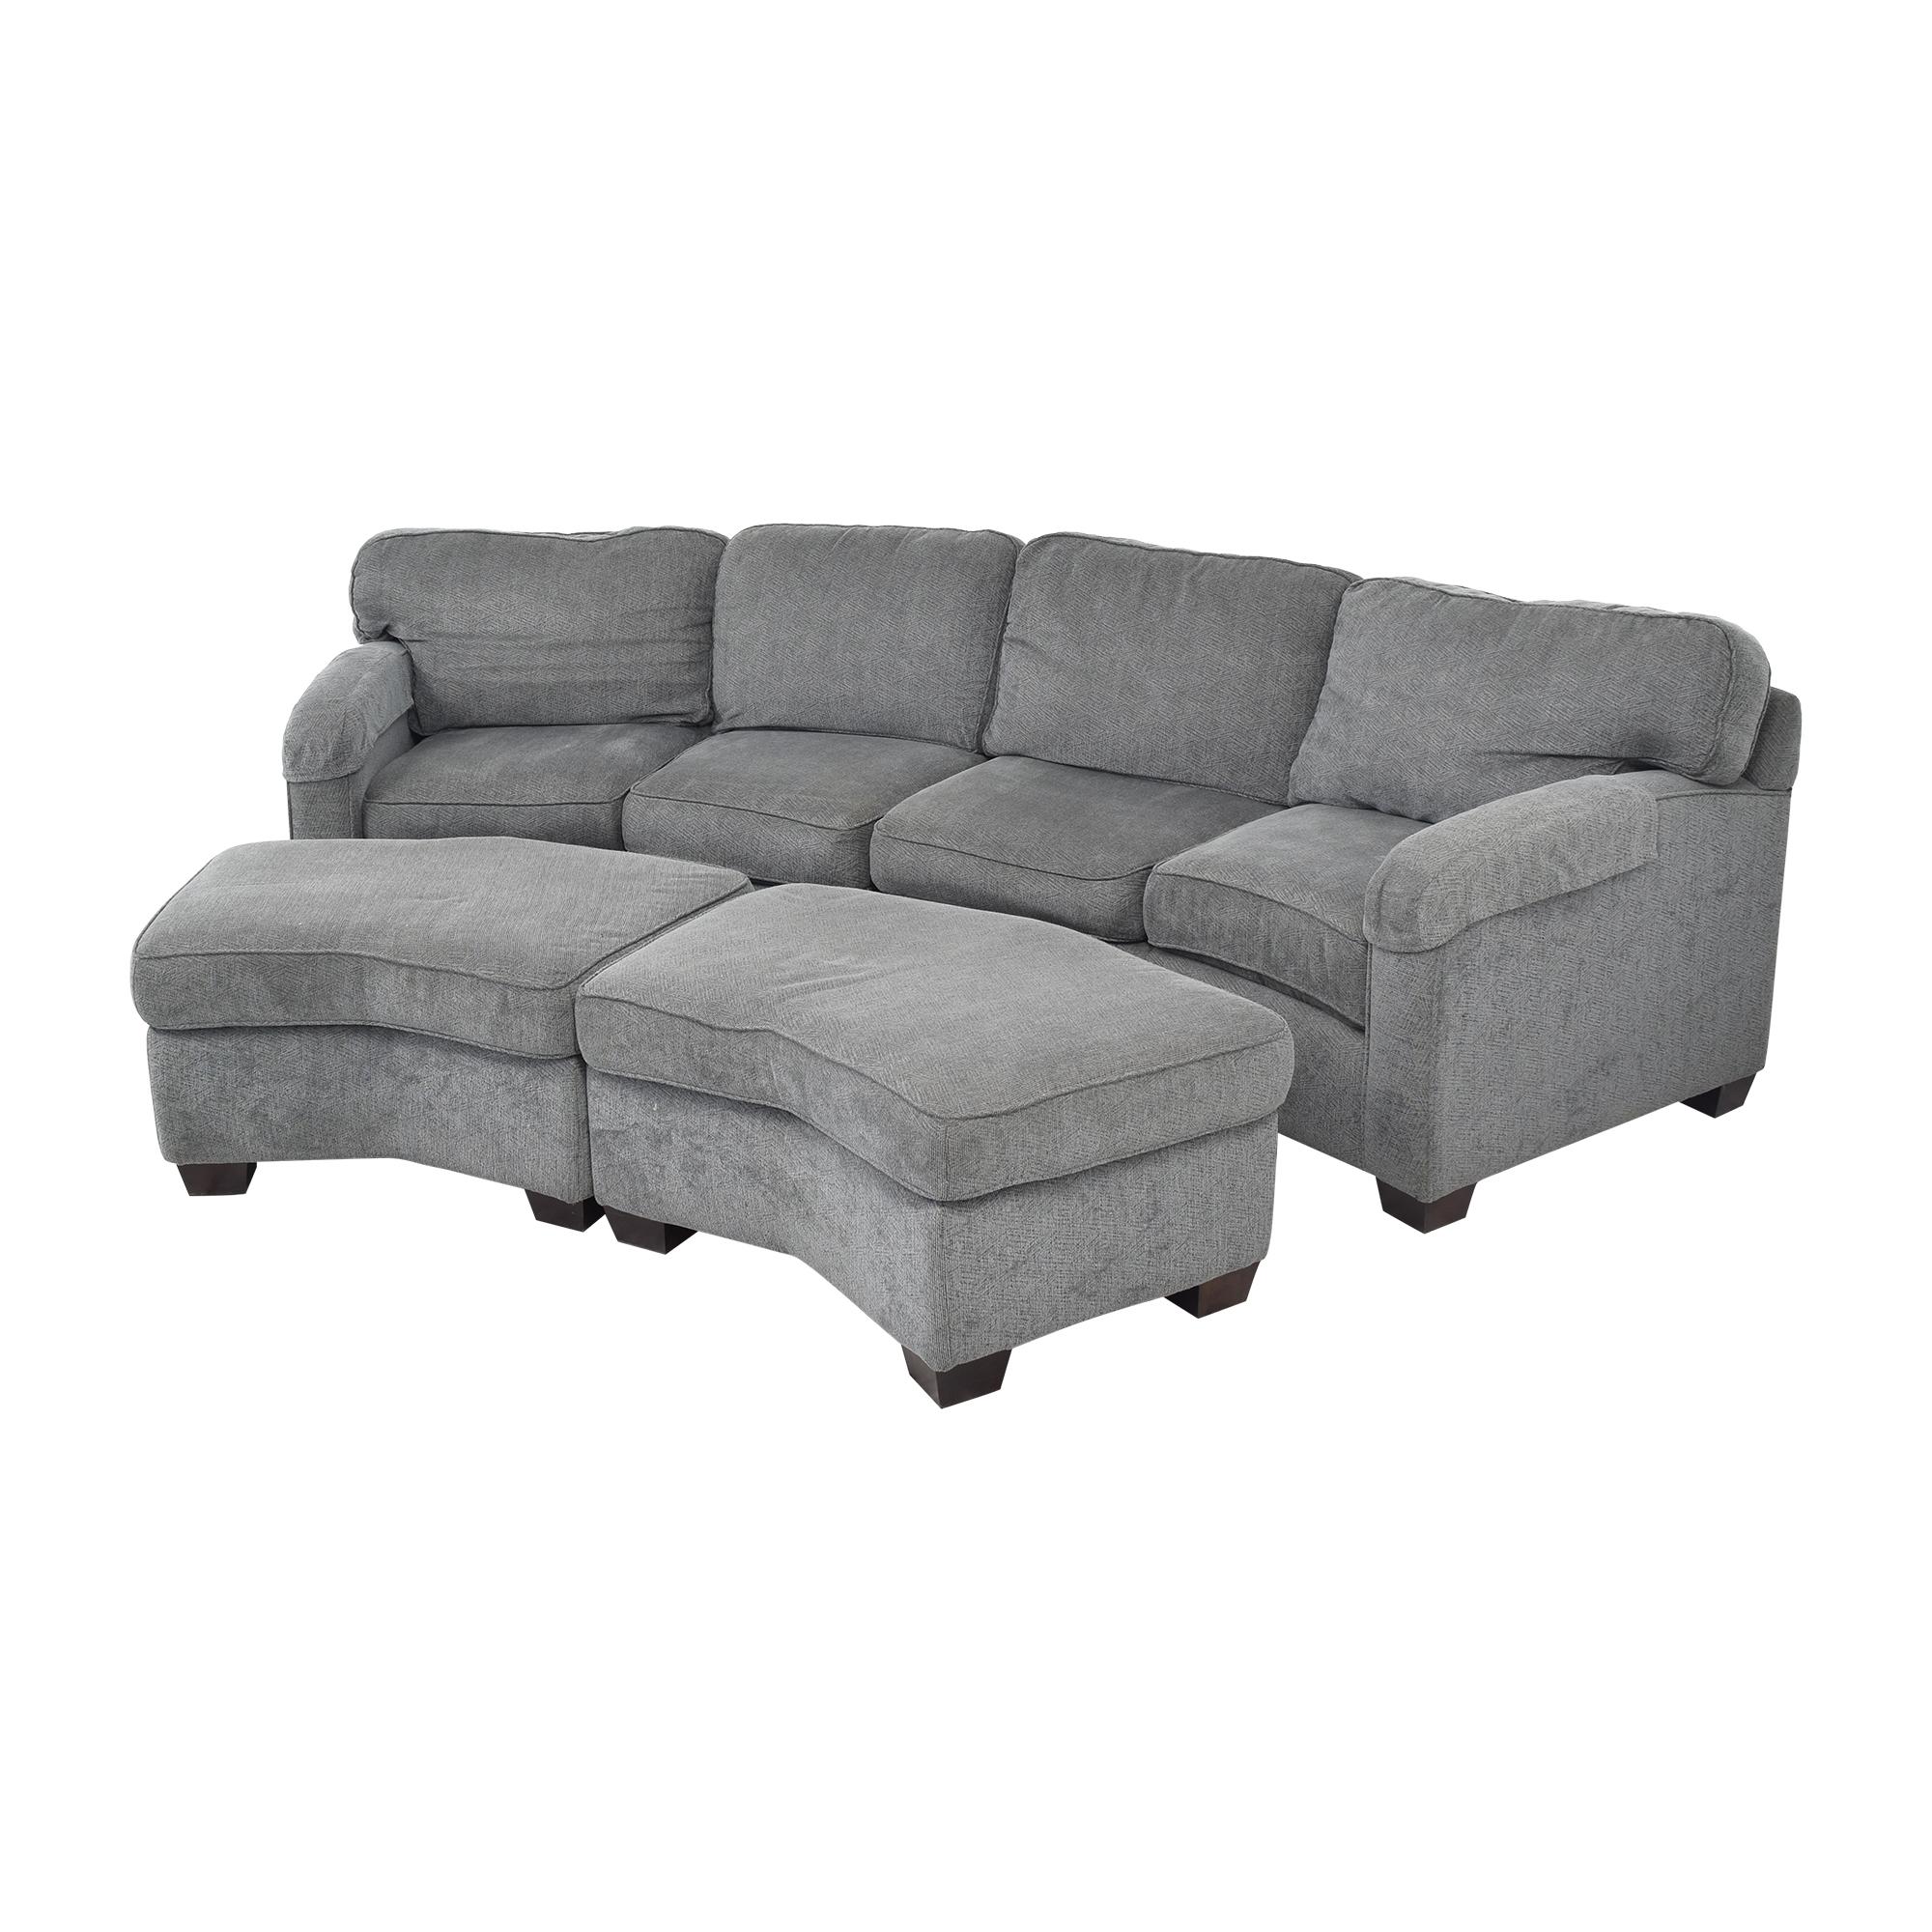 Bassett Furniture Bassett Furniture Sectional Sofa with Ottomans discount